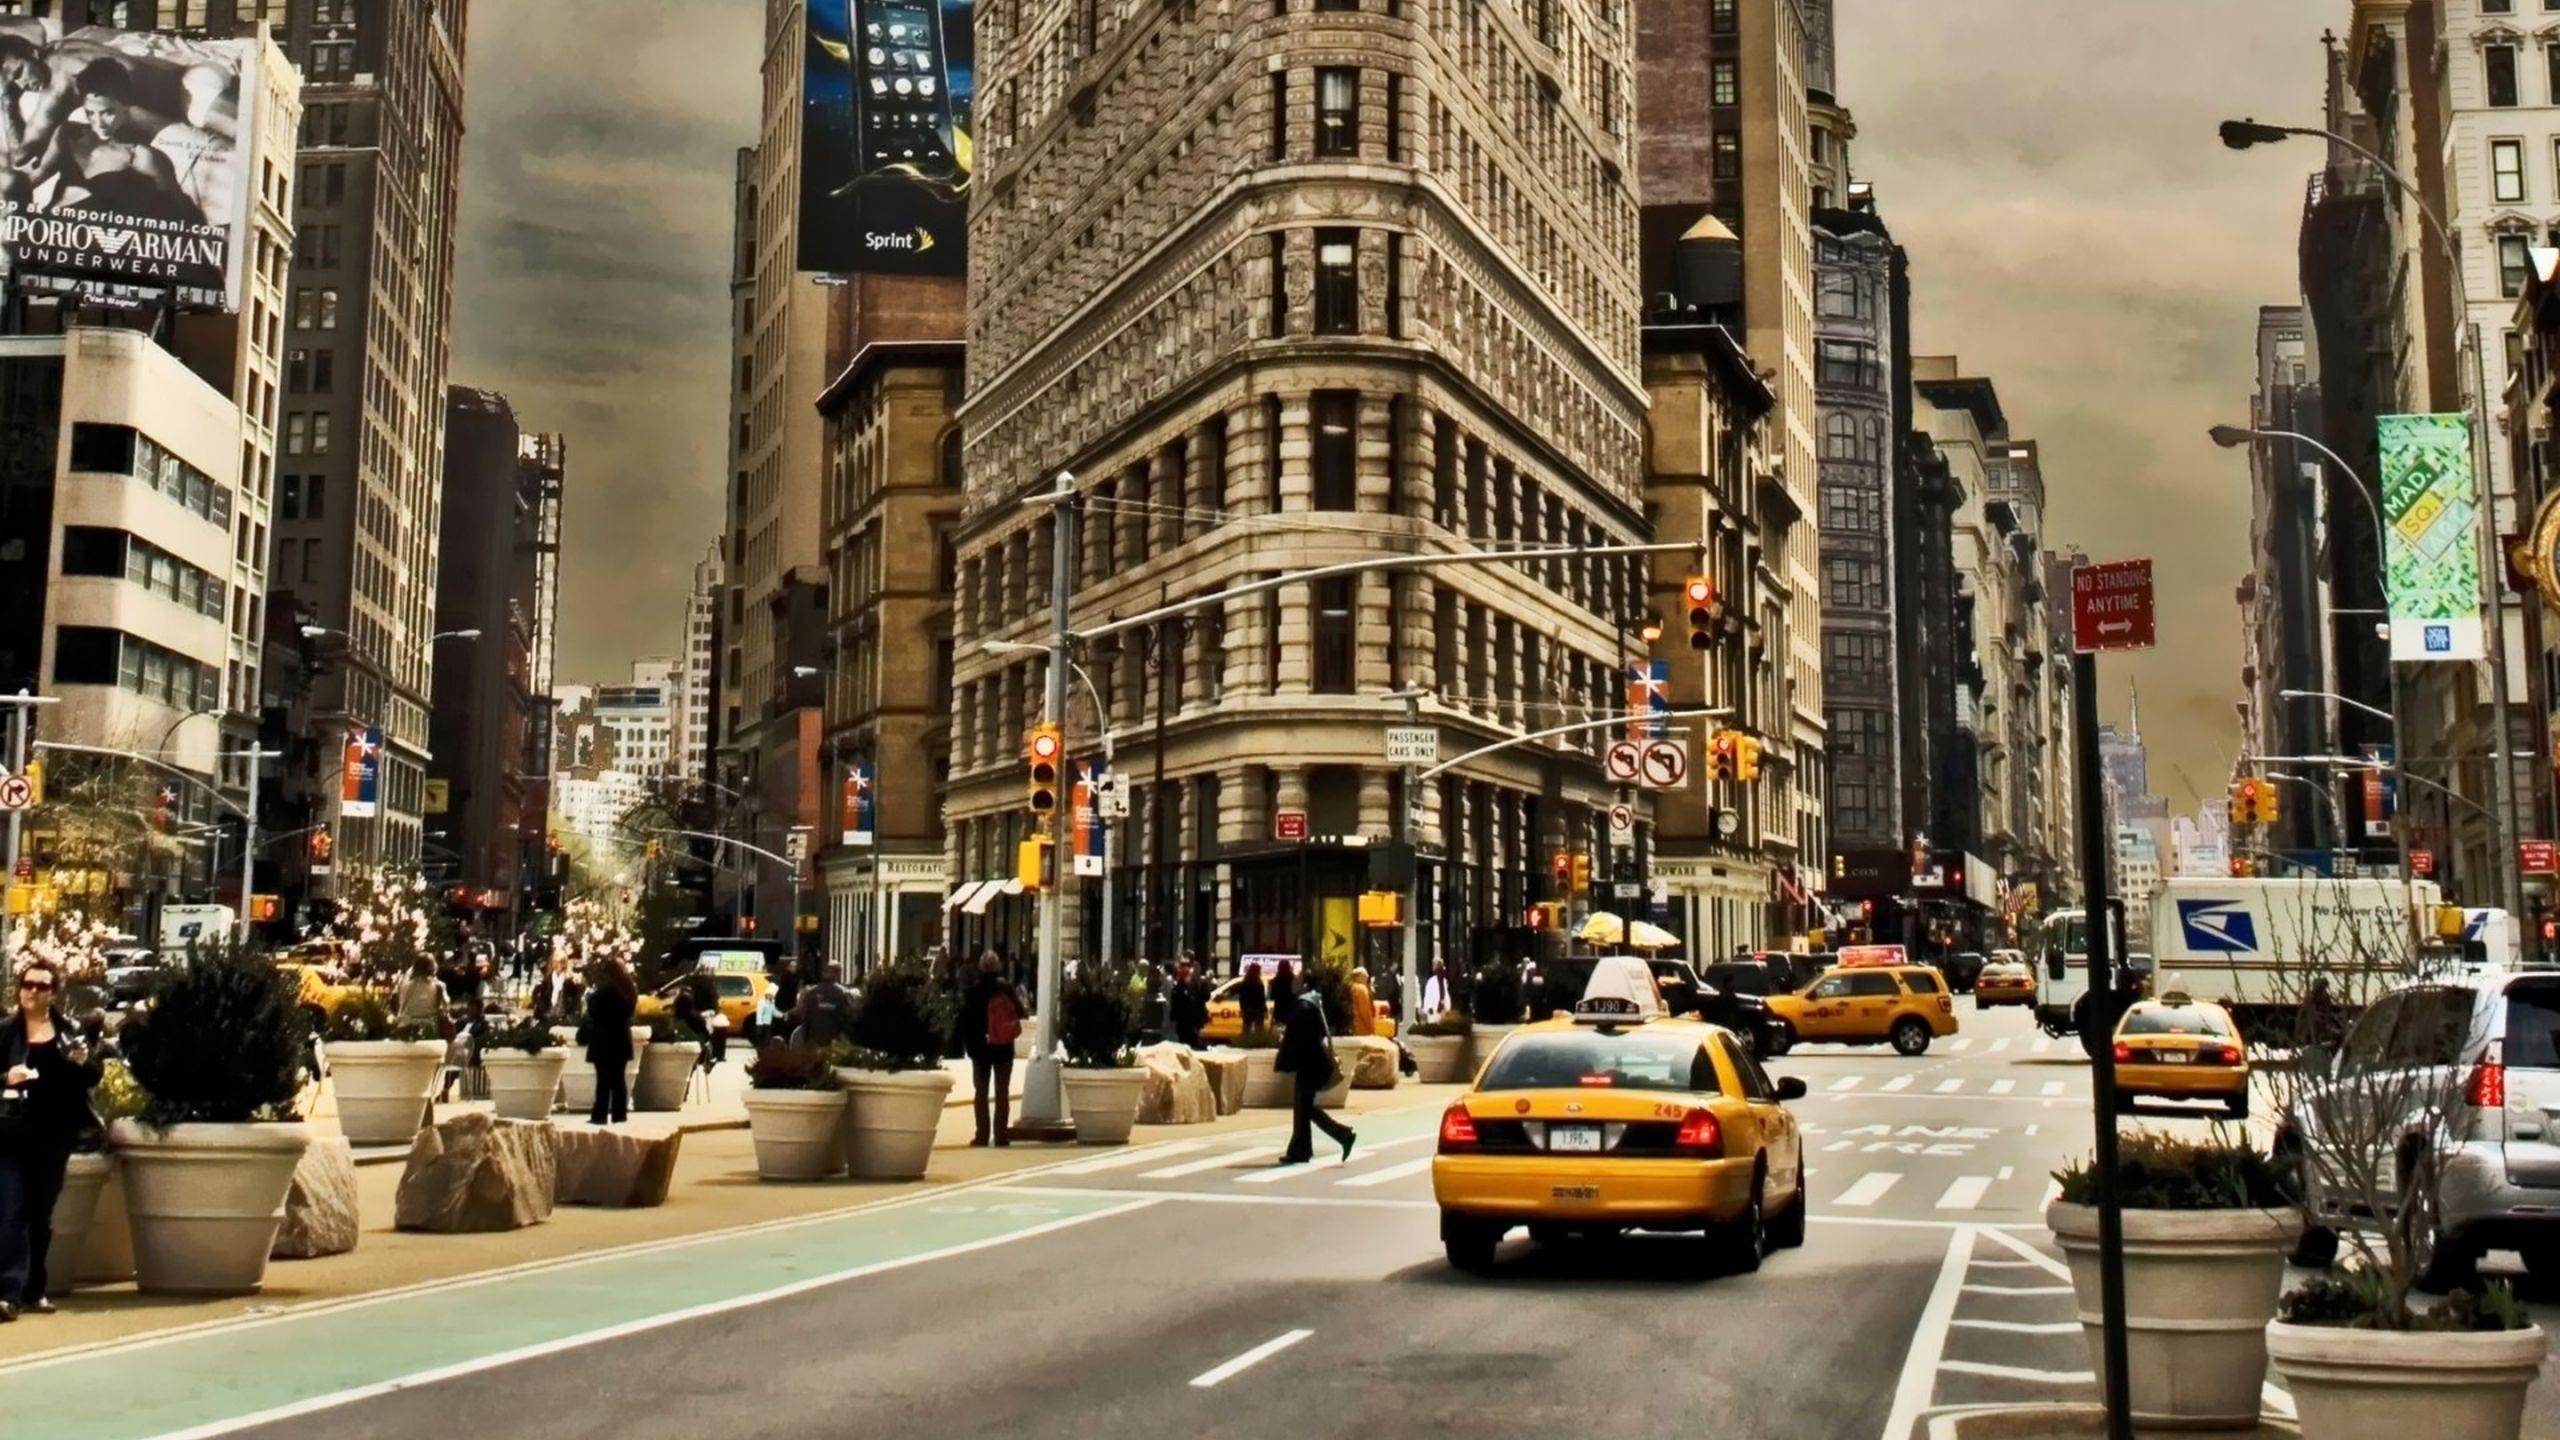 Afternoon On Manhattan City Imac Wallpaper Hd Wallpapers Source New York Wallpaper New York City Buildings New York City Photos